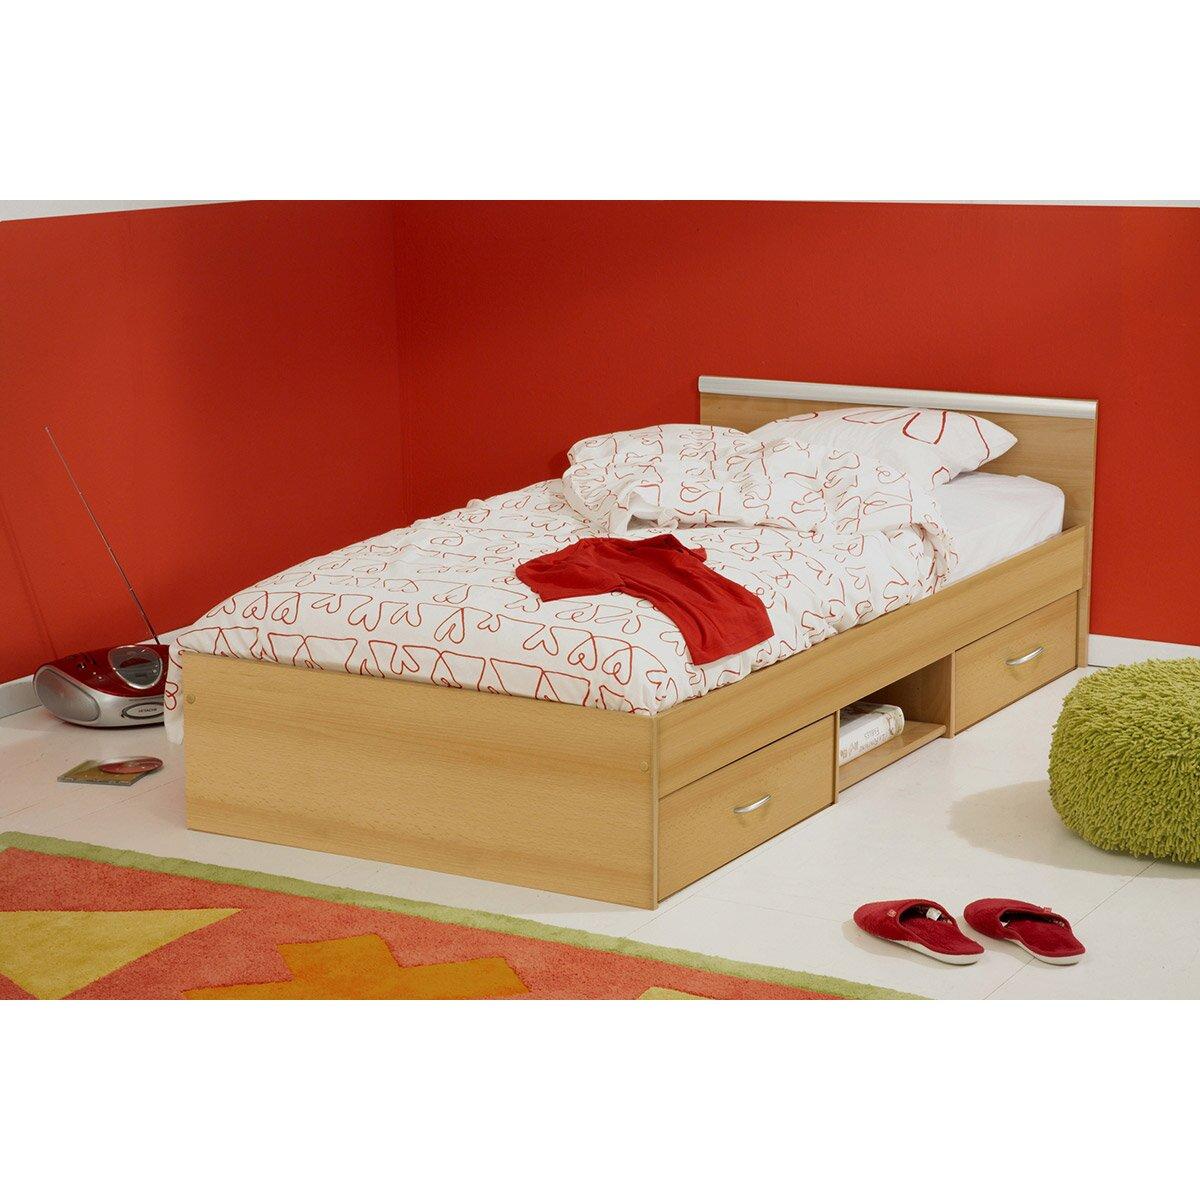 Parisot Bed King